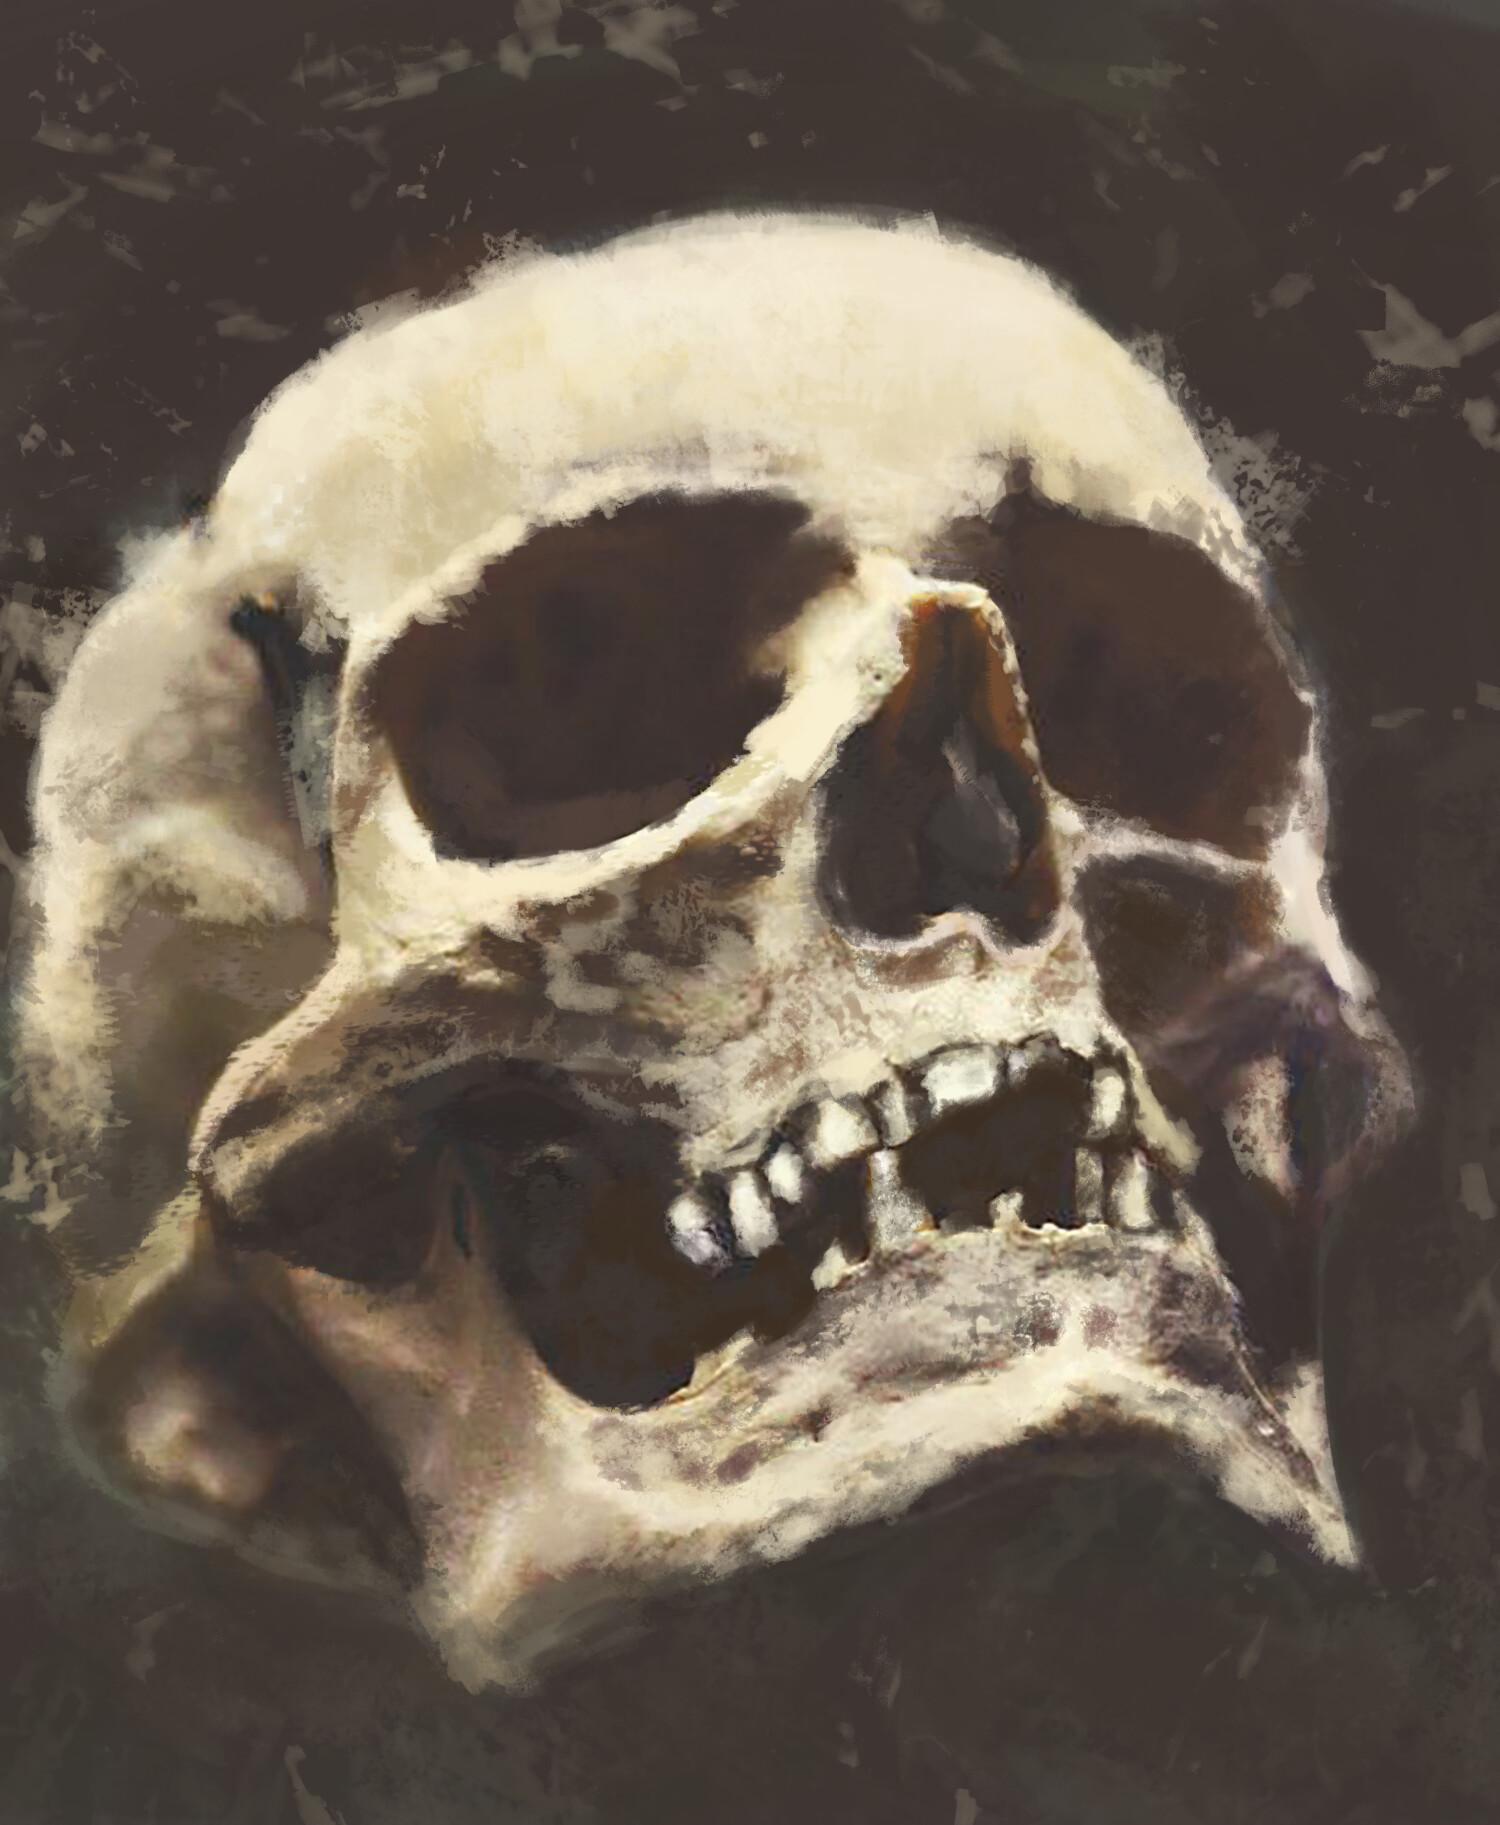 George mylonas skull copy